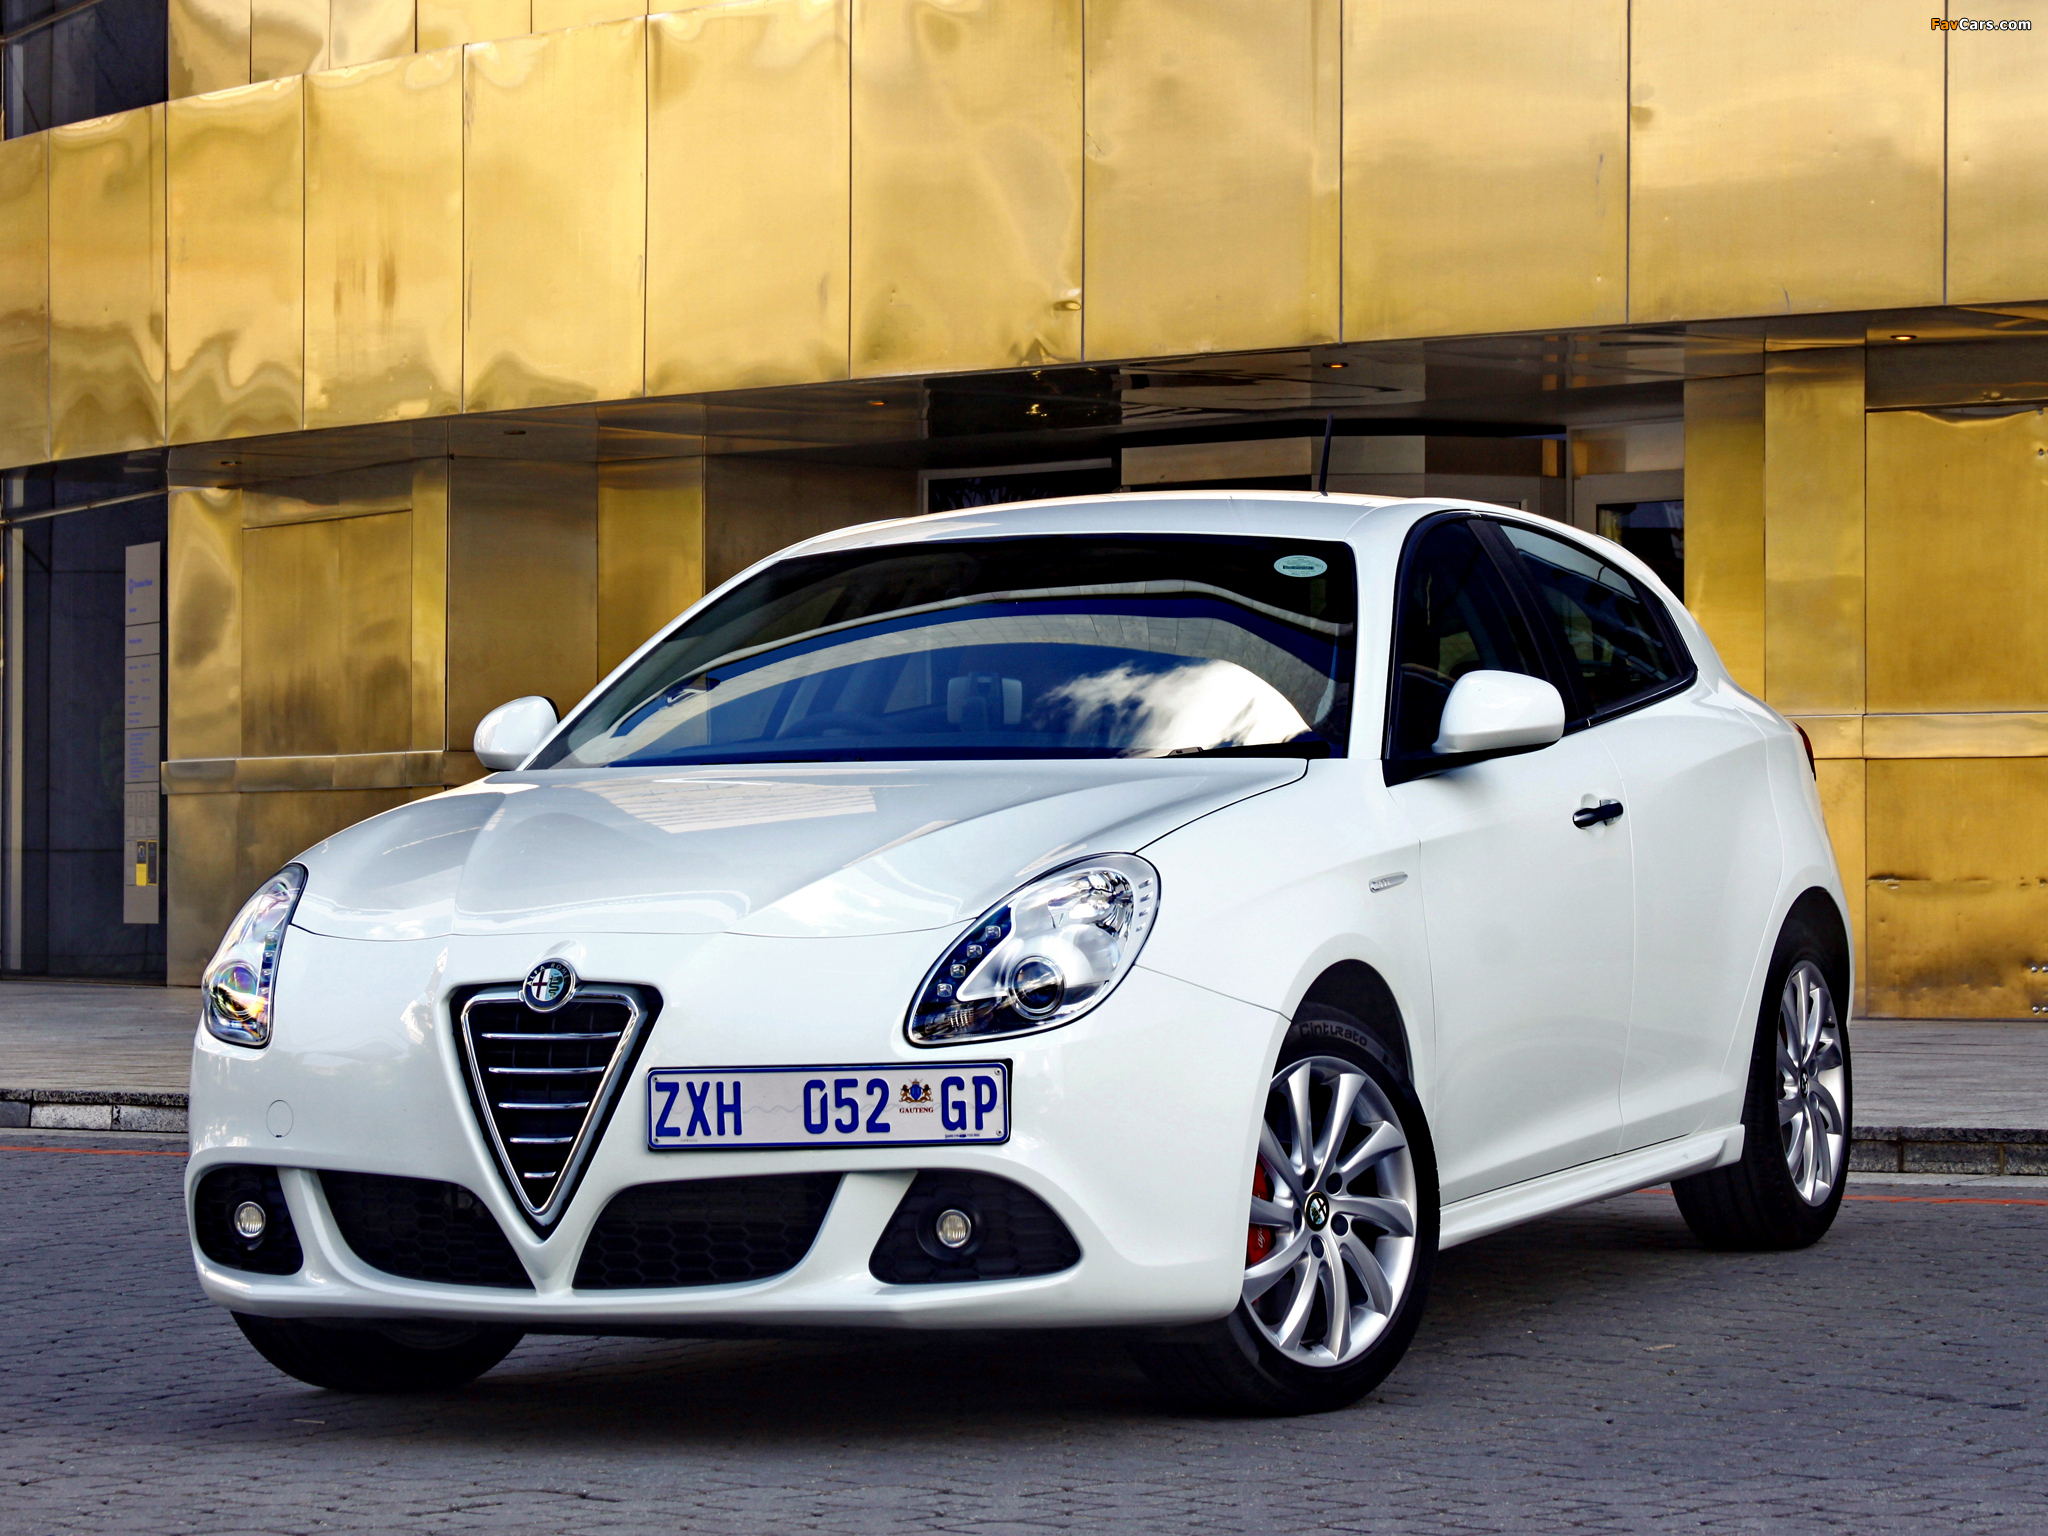 Alfa Romeo Giulietta ZA-spec 940 (2011) photos (2048 x 1536)